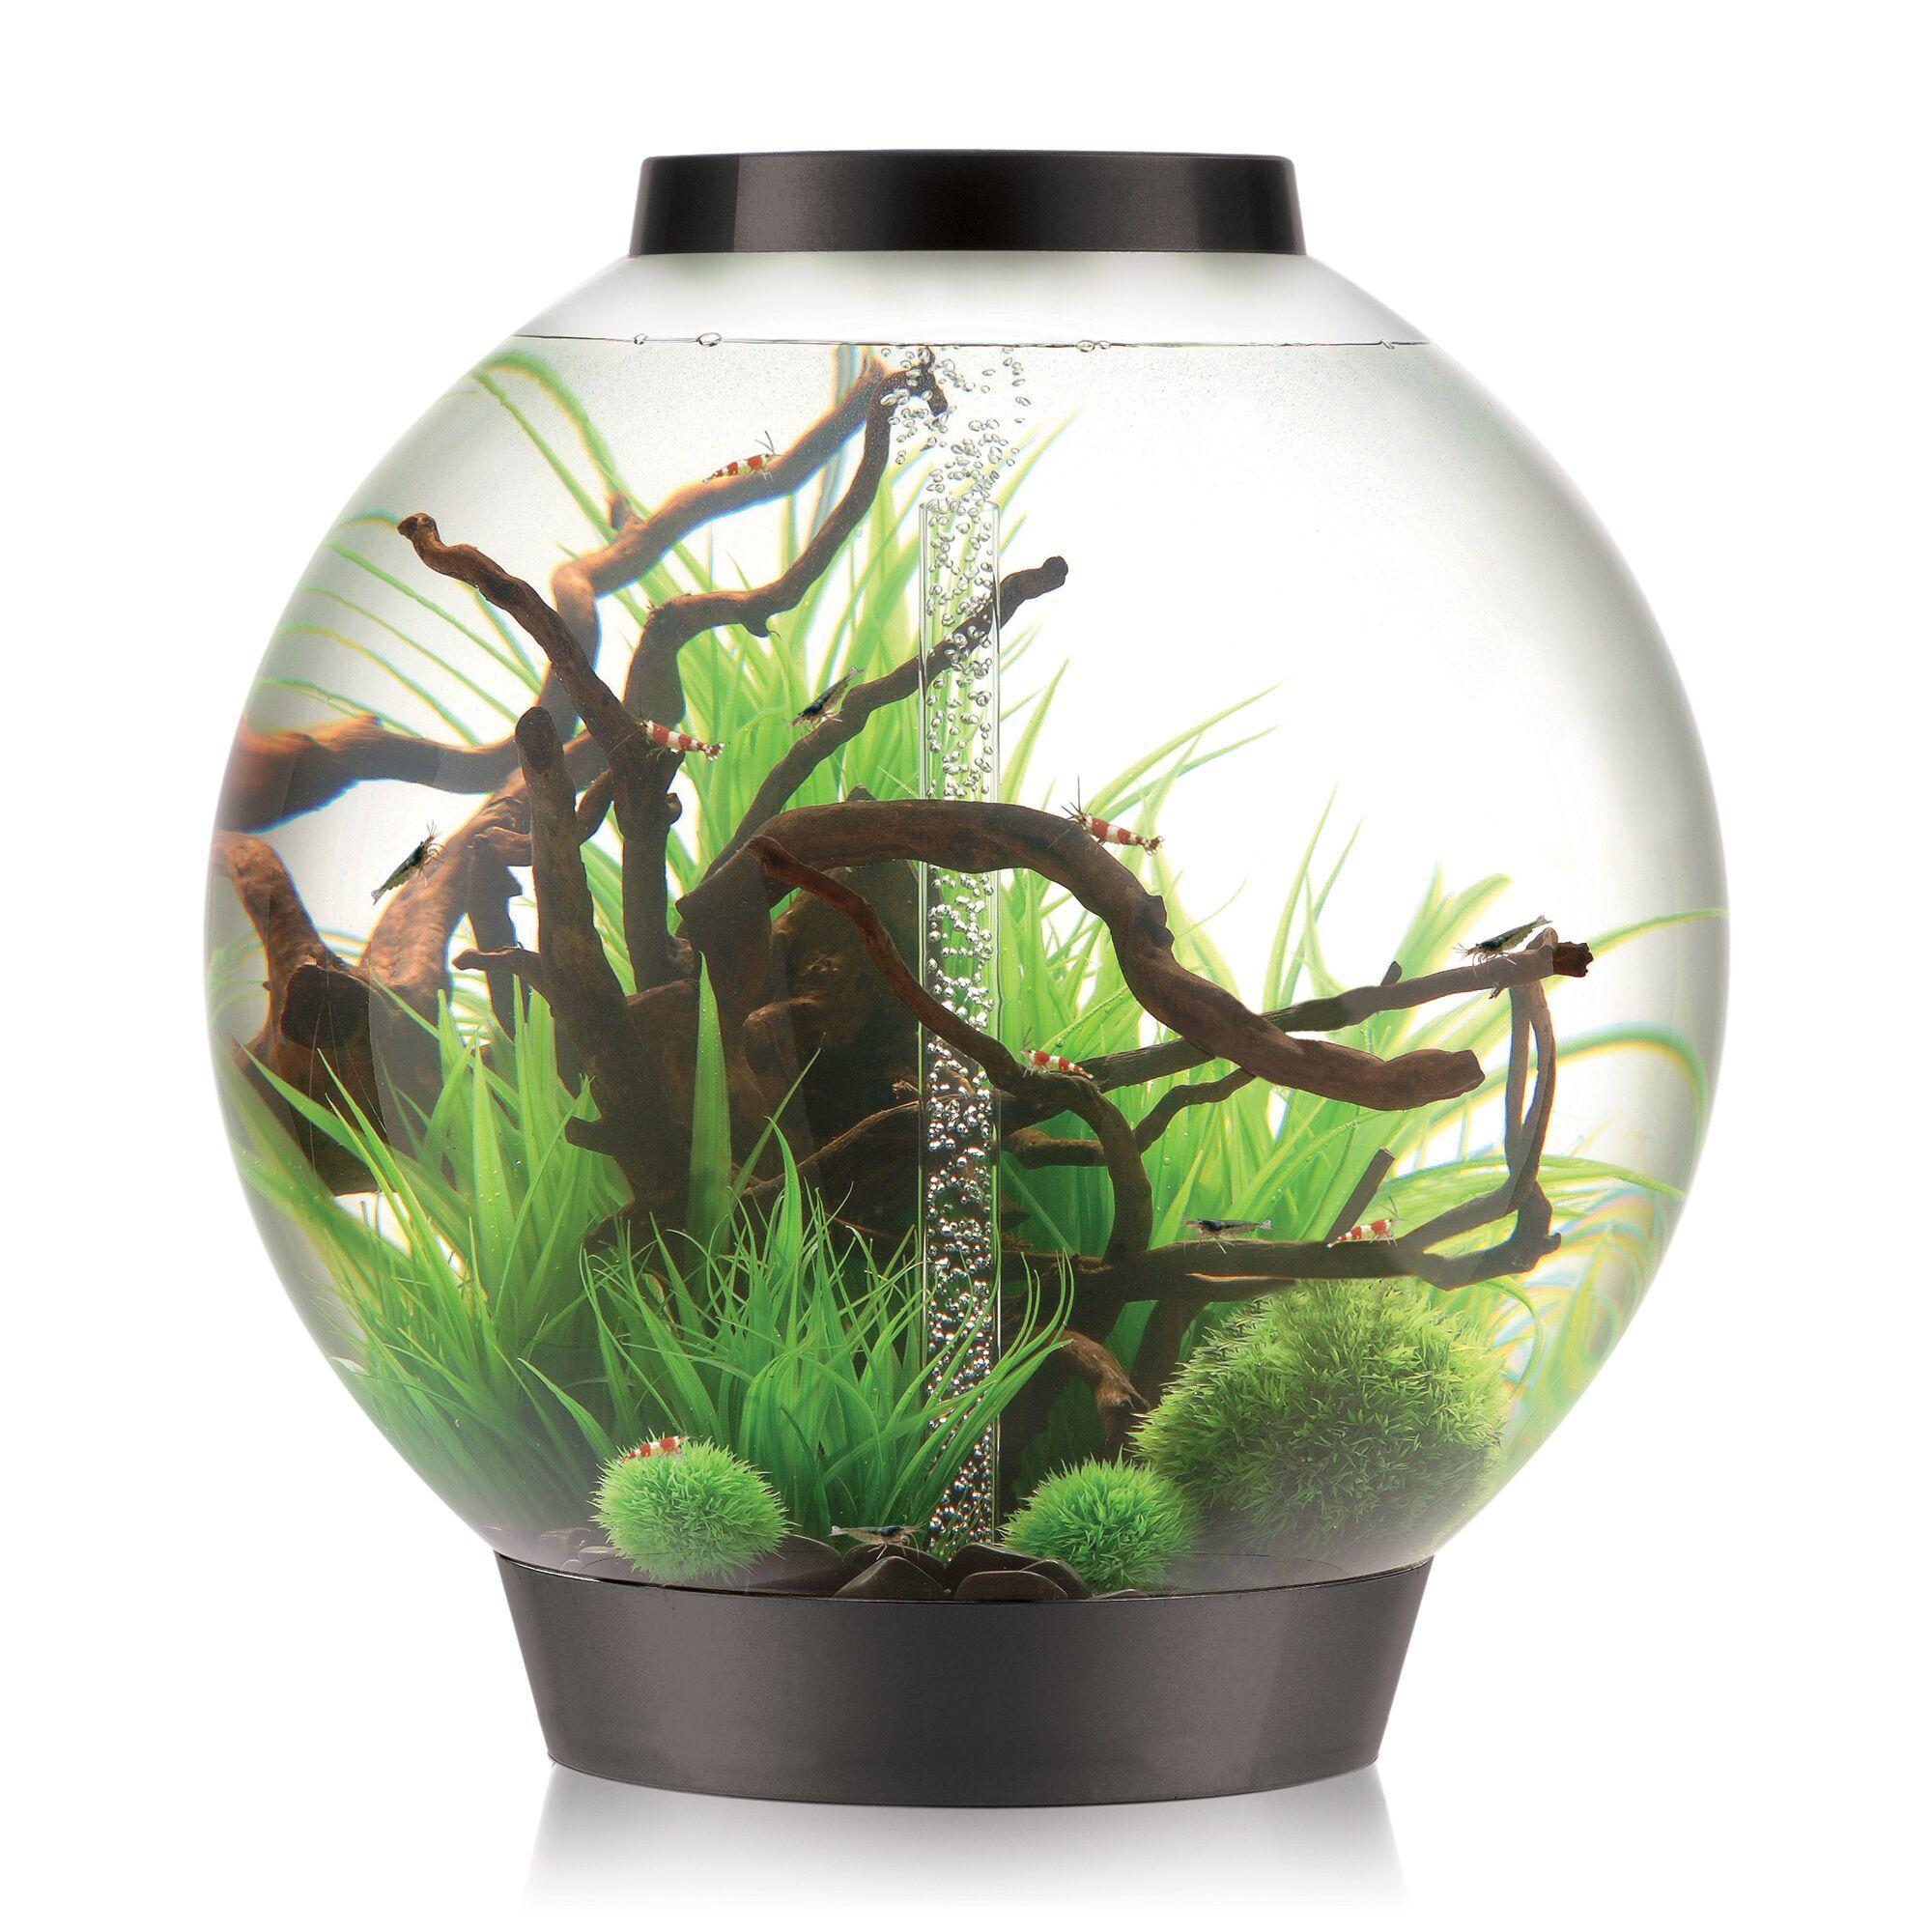 4 Gallon Classic Aquarium Bowl Color: Silver, Size: 12.5